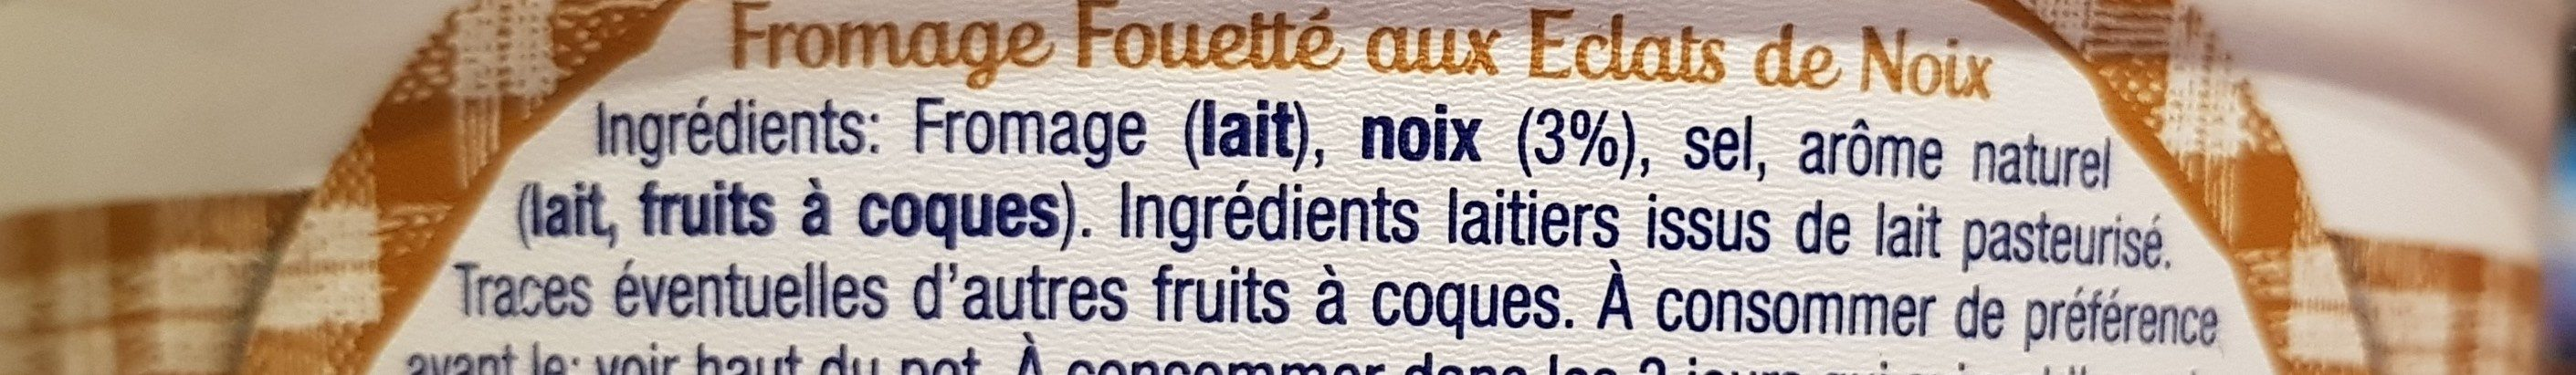 Fromage Fouetté Aux Noix Madame Loïk - Ingrediënten - fr